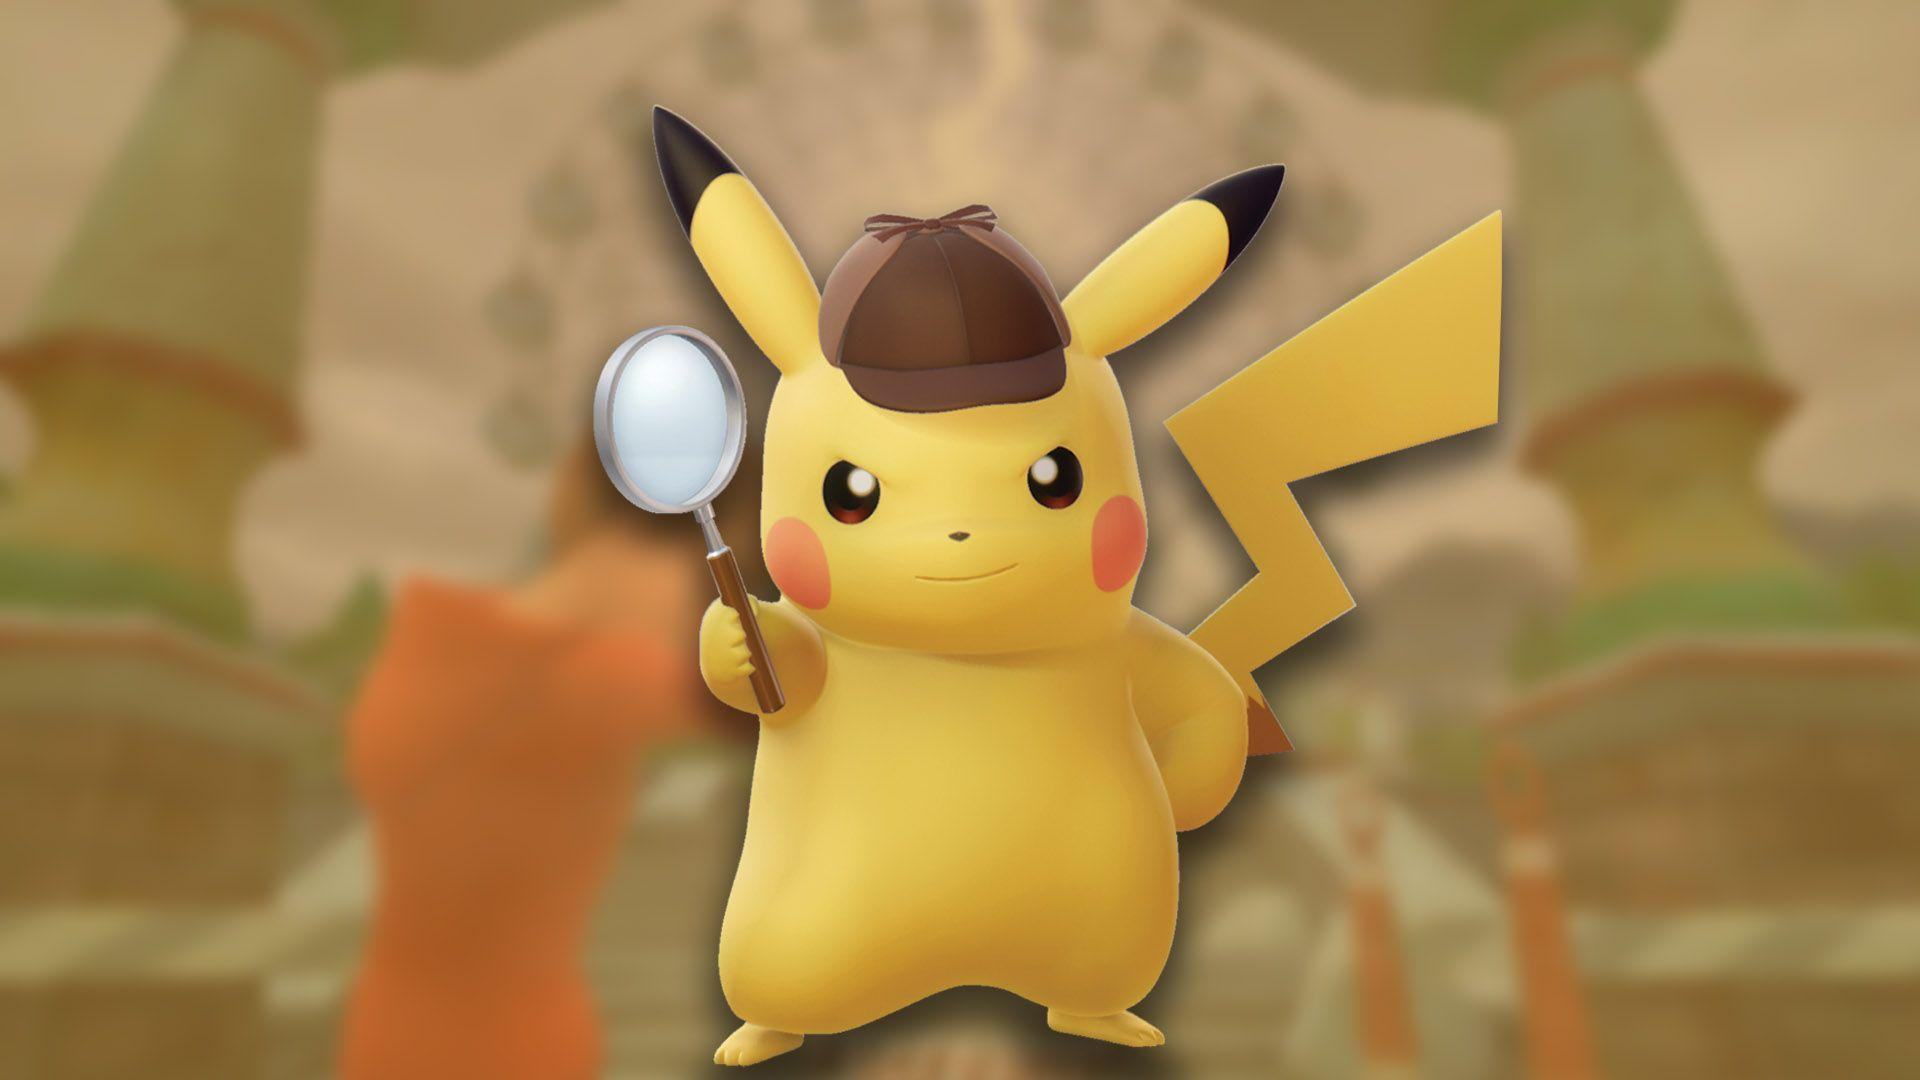 Pokemon Detective Pikachu Hd Wallpapers Wallpaper Cave